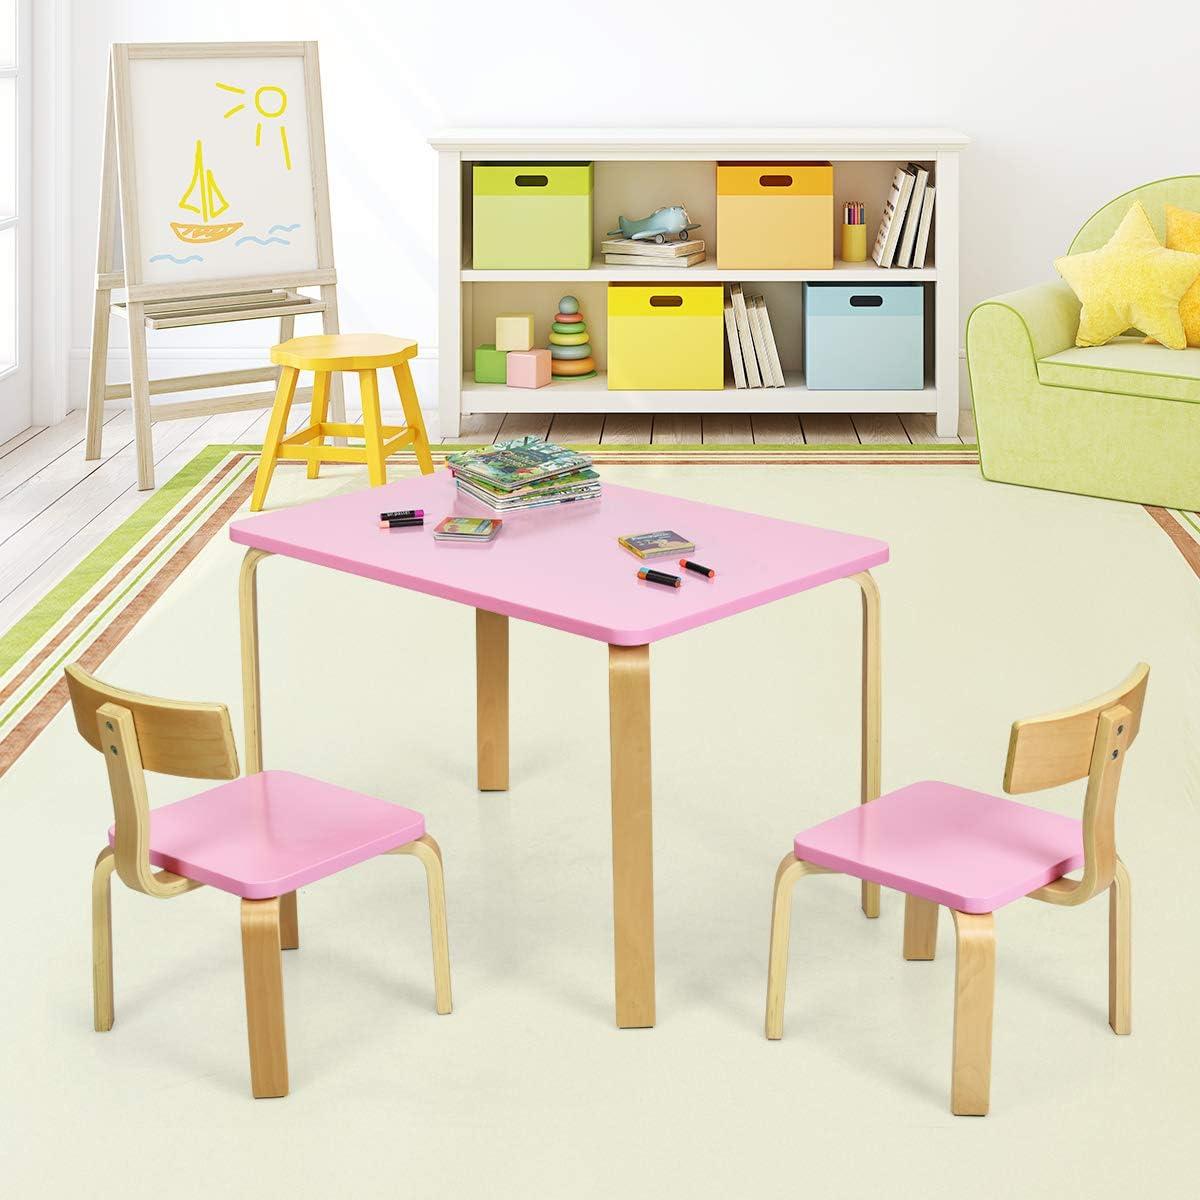 Kinderm/öbel aus Holz Kindersitzgruppe COSTWAY Sitzgruppe Kinder Kindertisch mit 2 Kinderst/ühlen Kindertischgruppe pink 3tlg